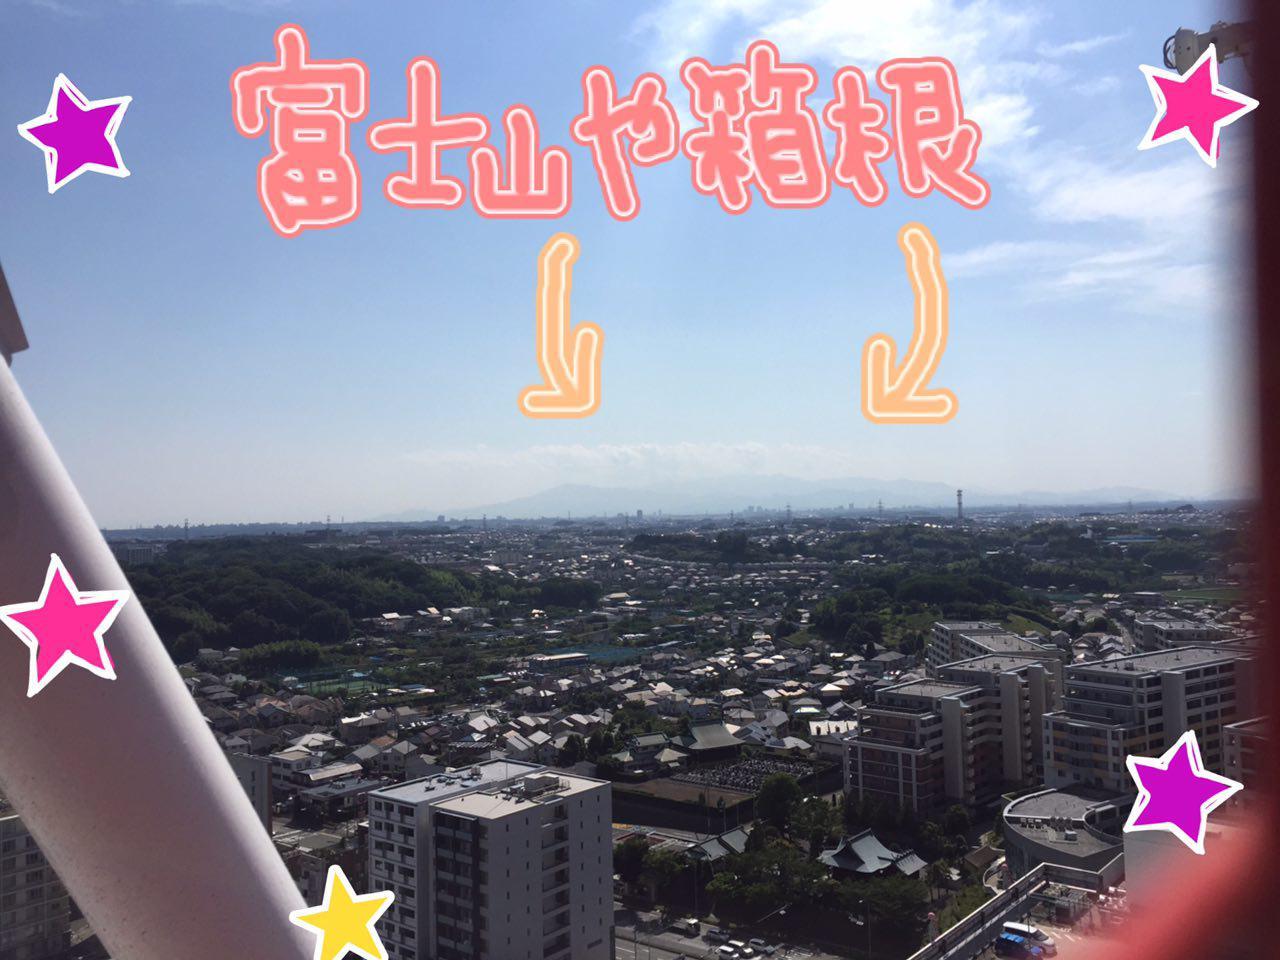 photo_2017-06-19_22-49-43.jpg